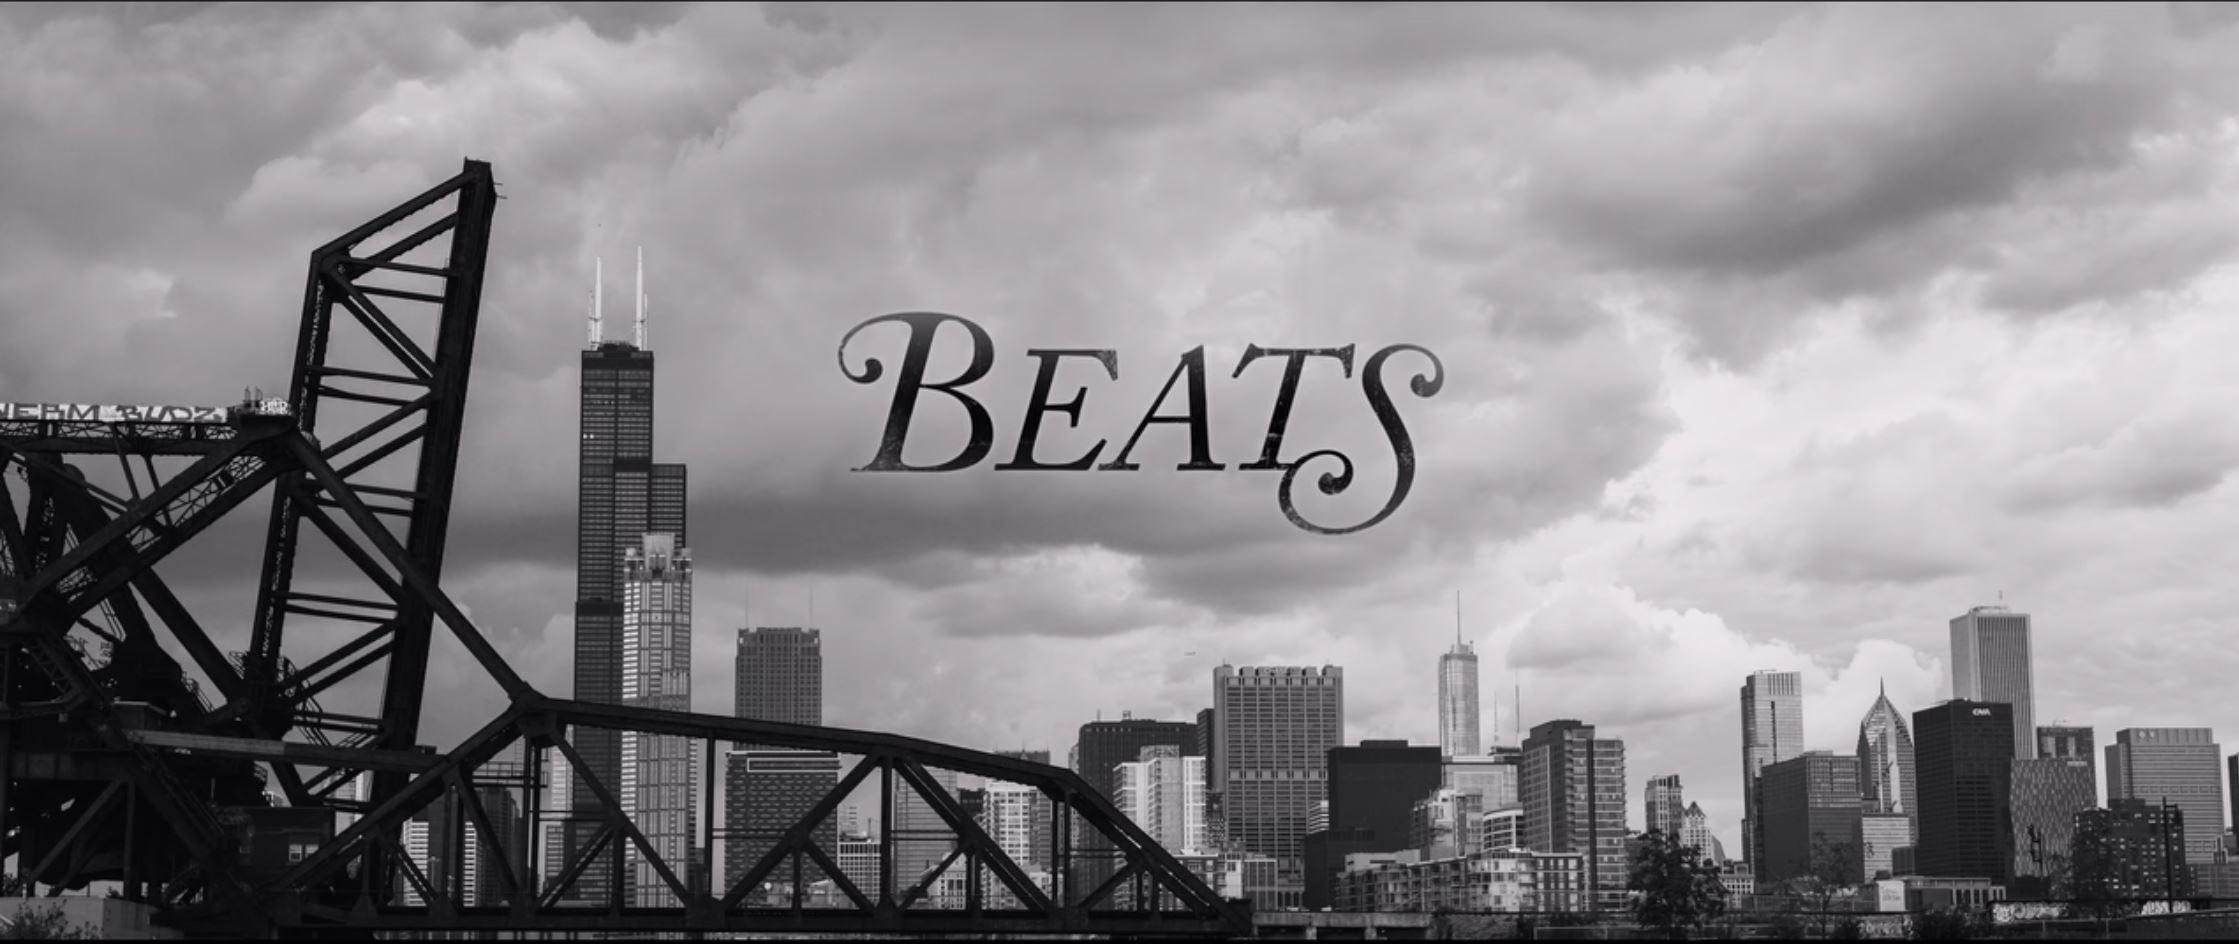 image of Netflix film title 'Beats' across Chicago skyline